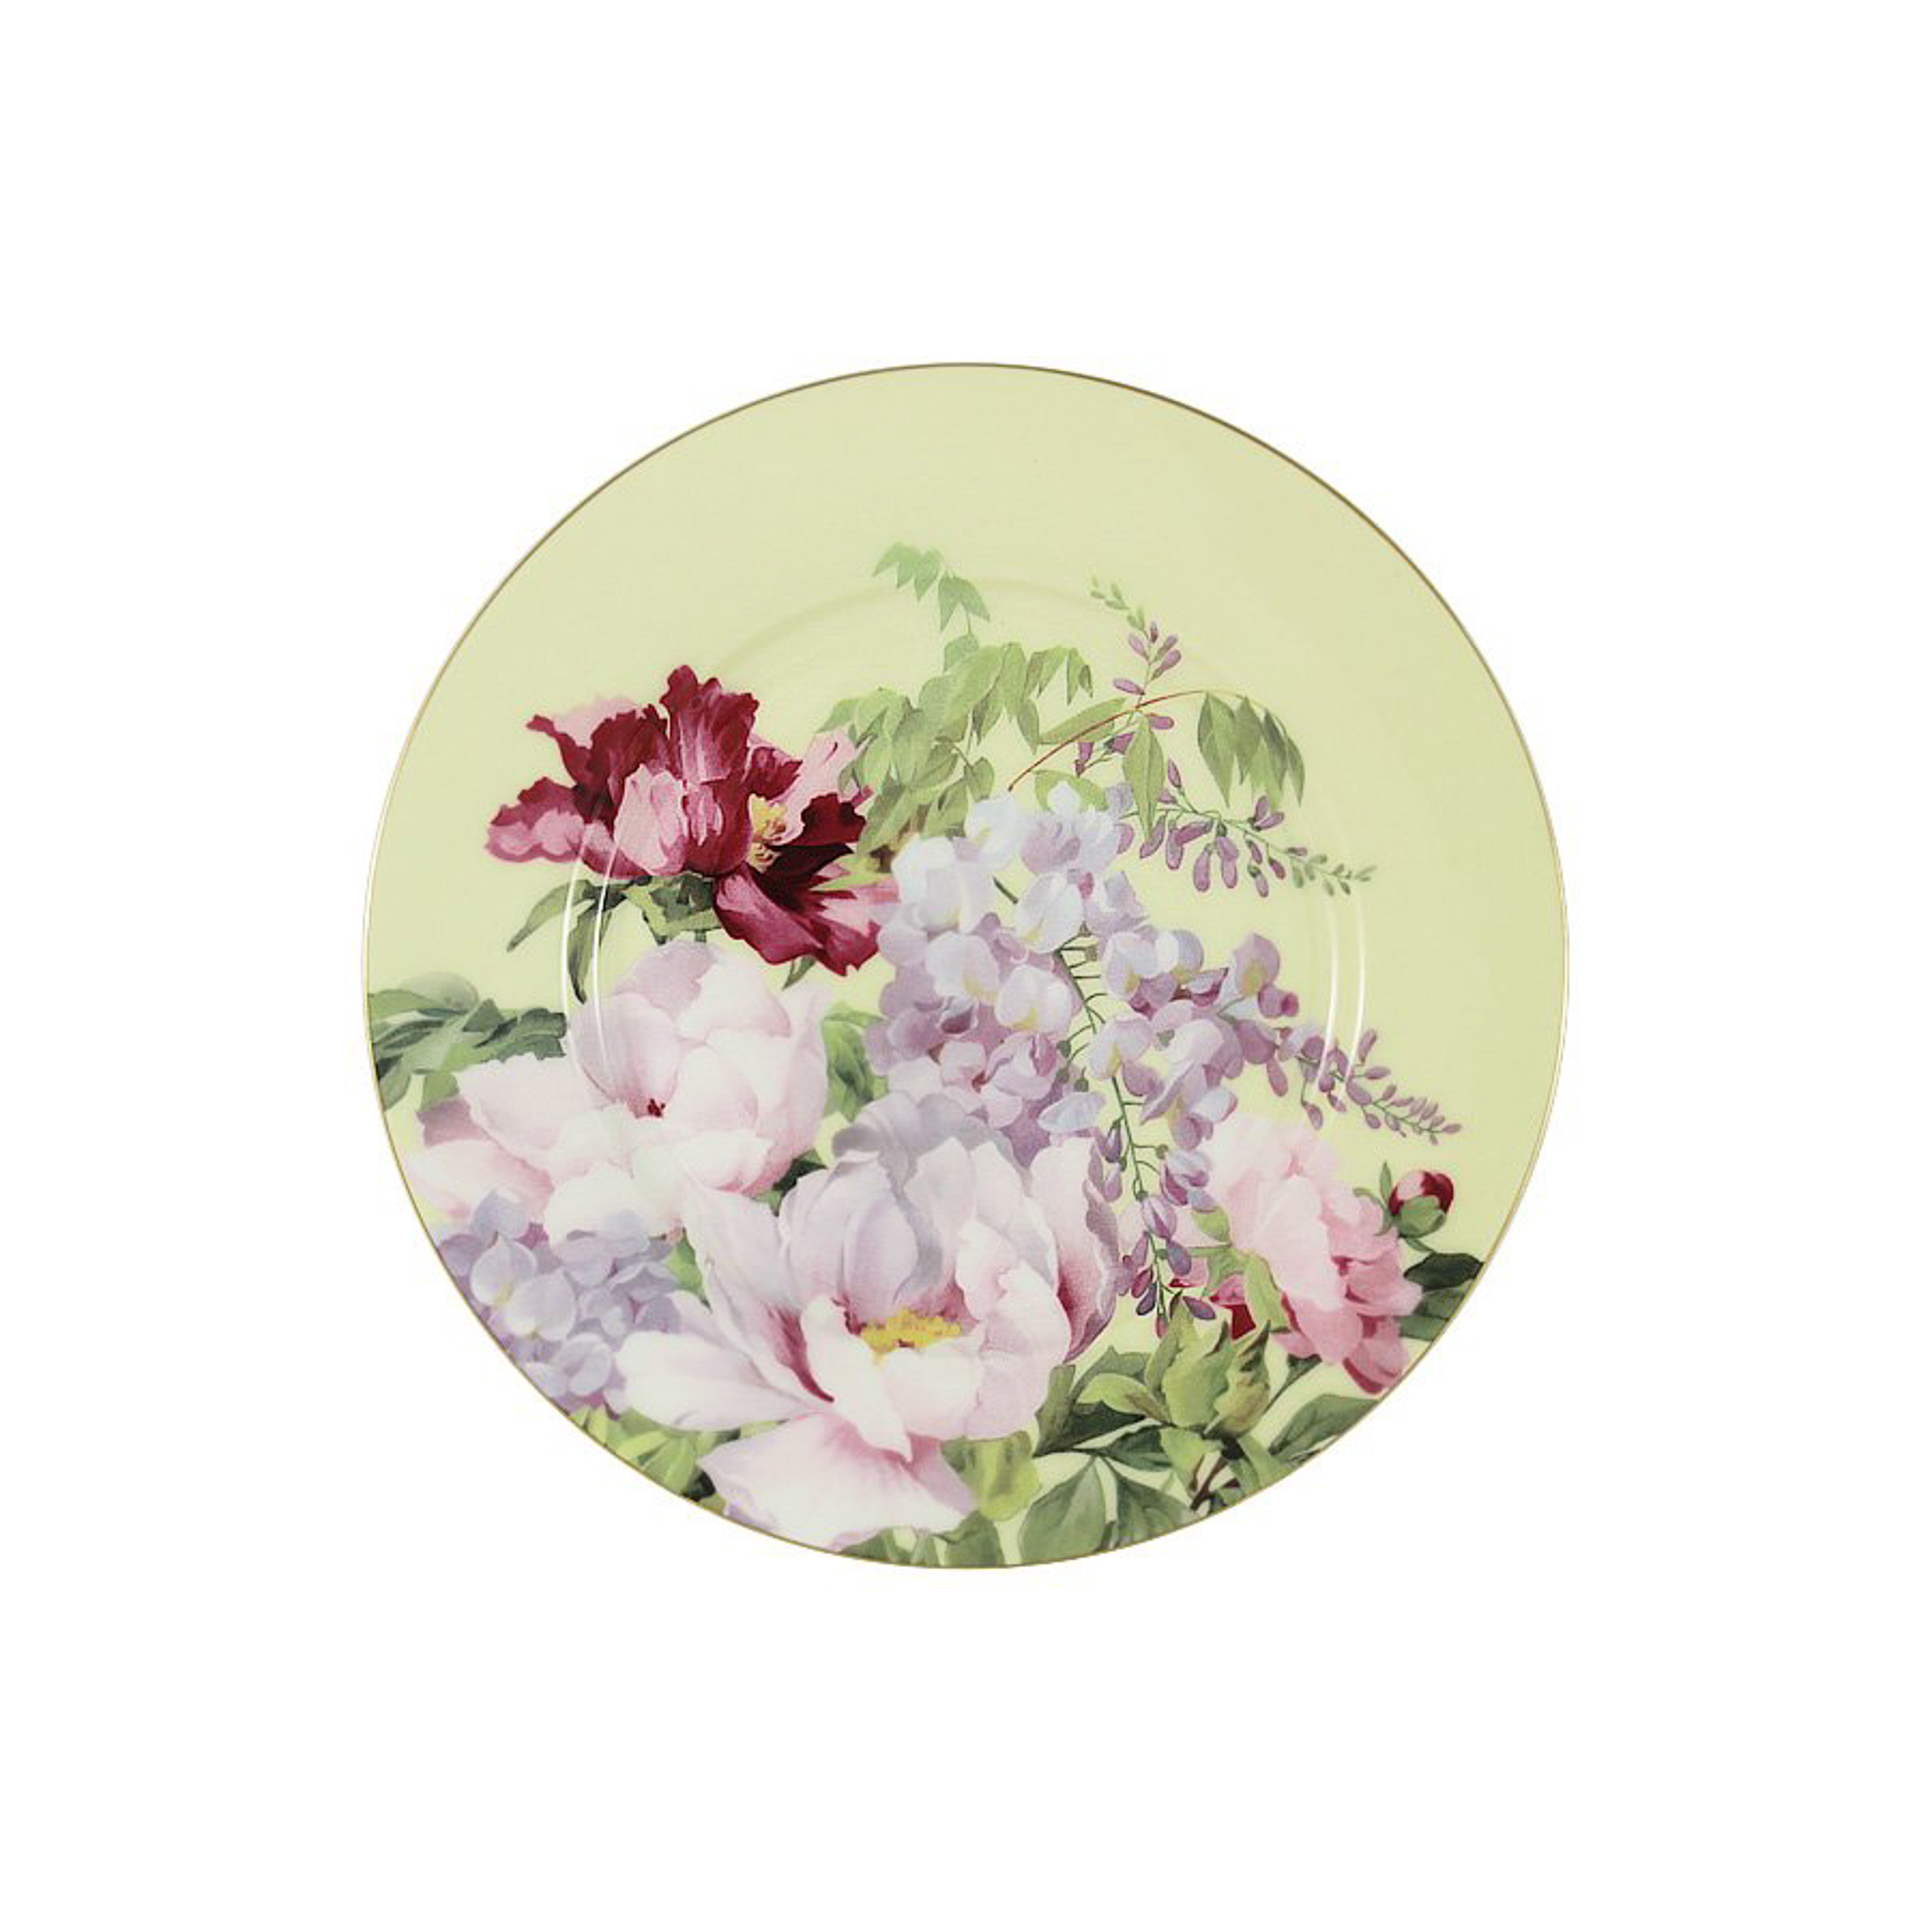 Тарелка десертная Anna Lafarg Райский сад желтый 19 см тарелка закусочная anna lafarg emily kamelia 19 см